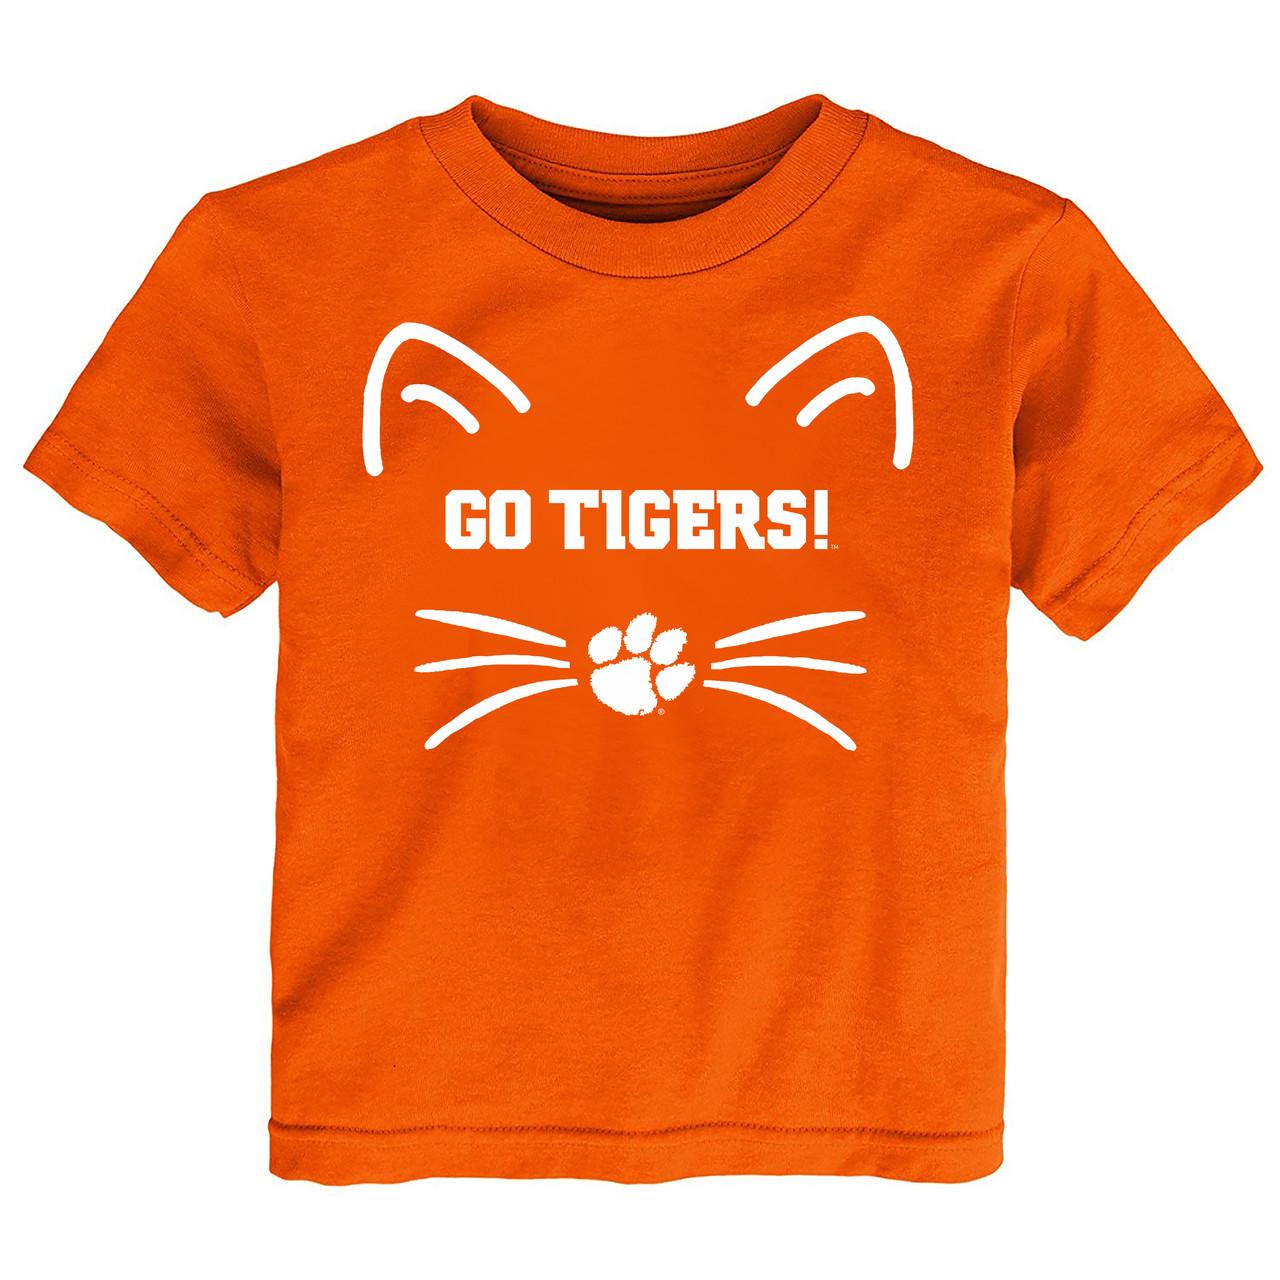 02e7ce7ee Clemson Tigers Football Baby Onesie